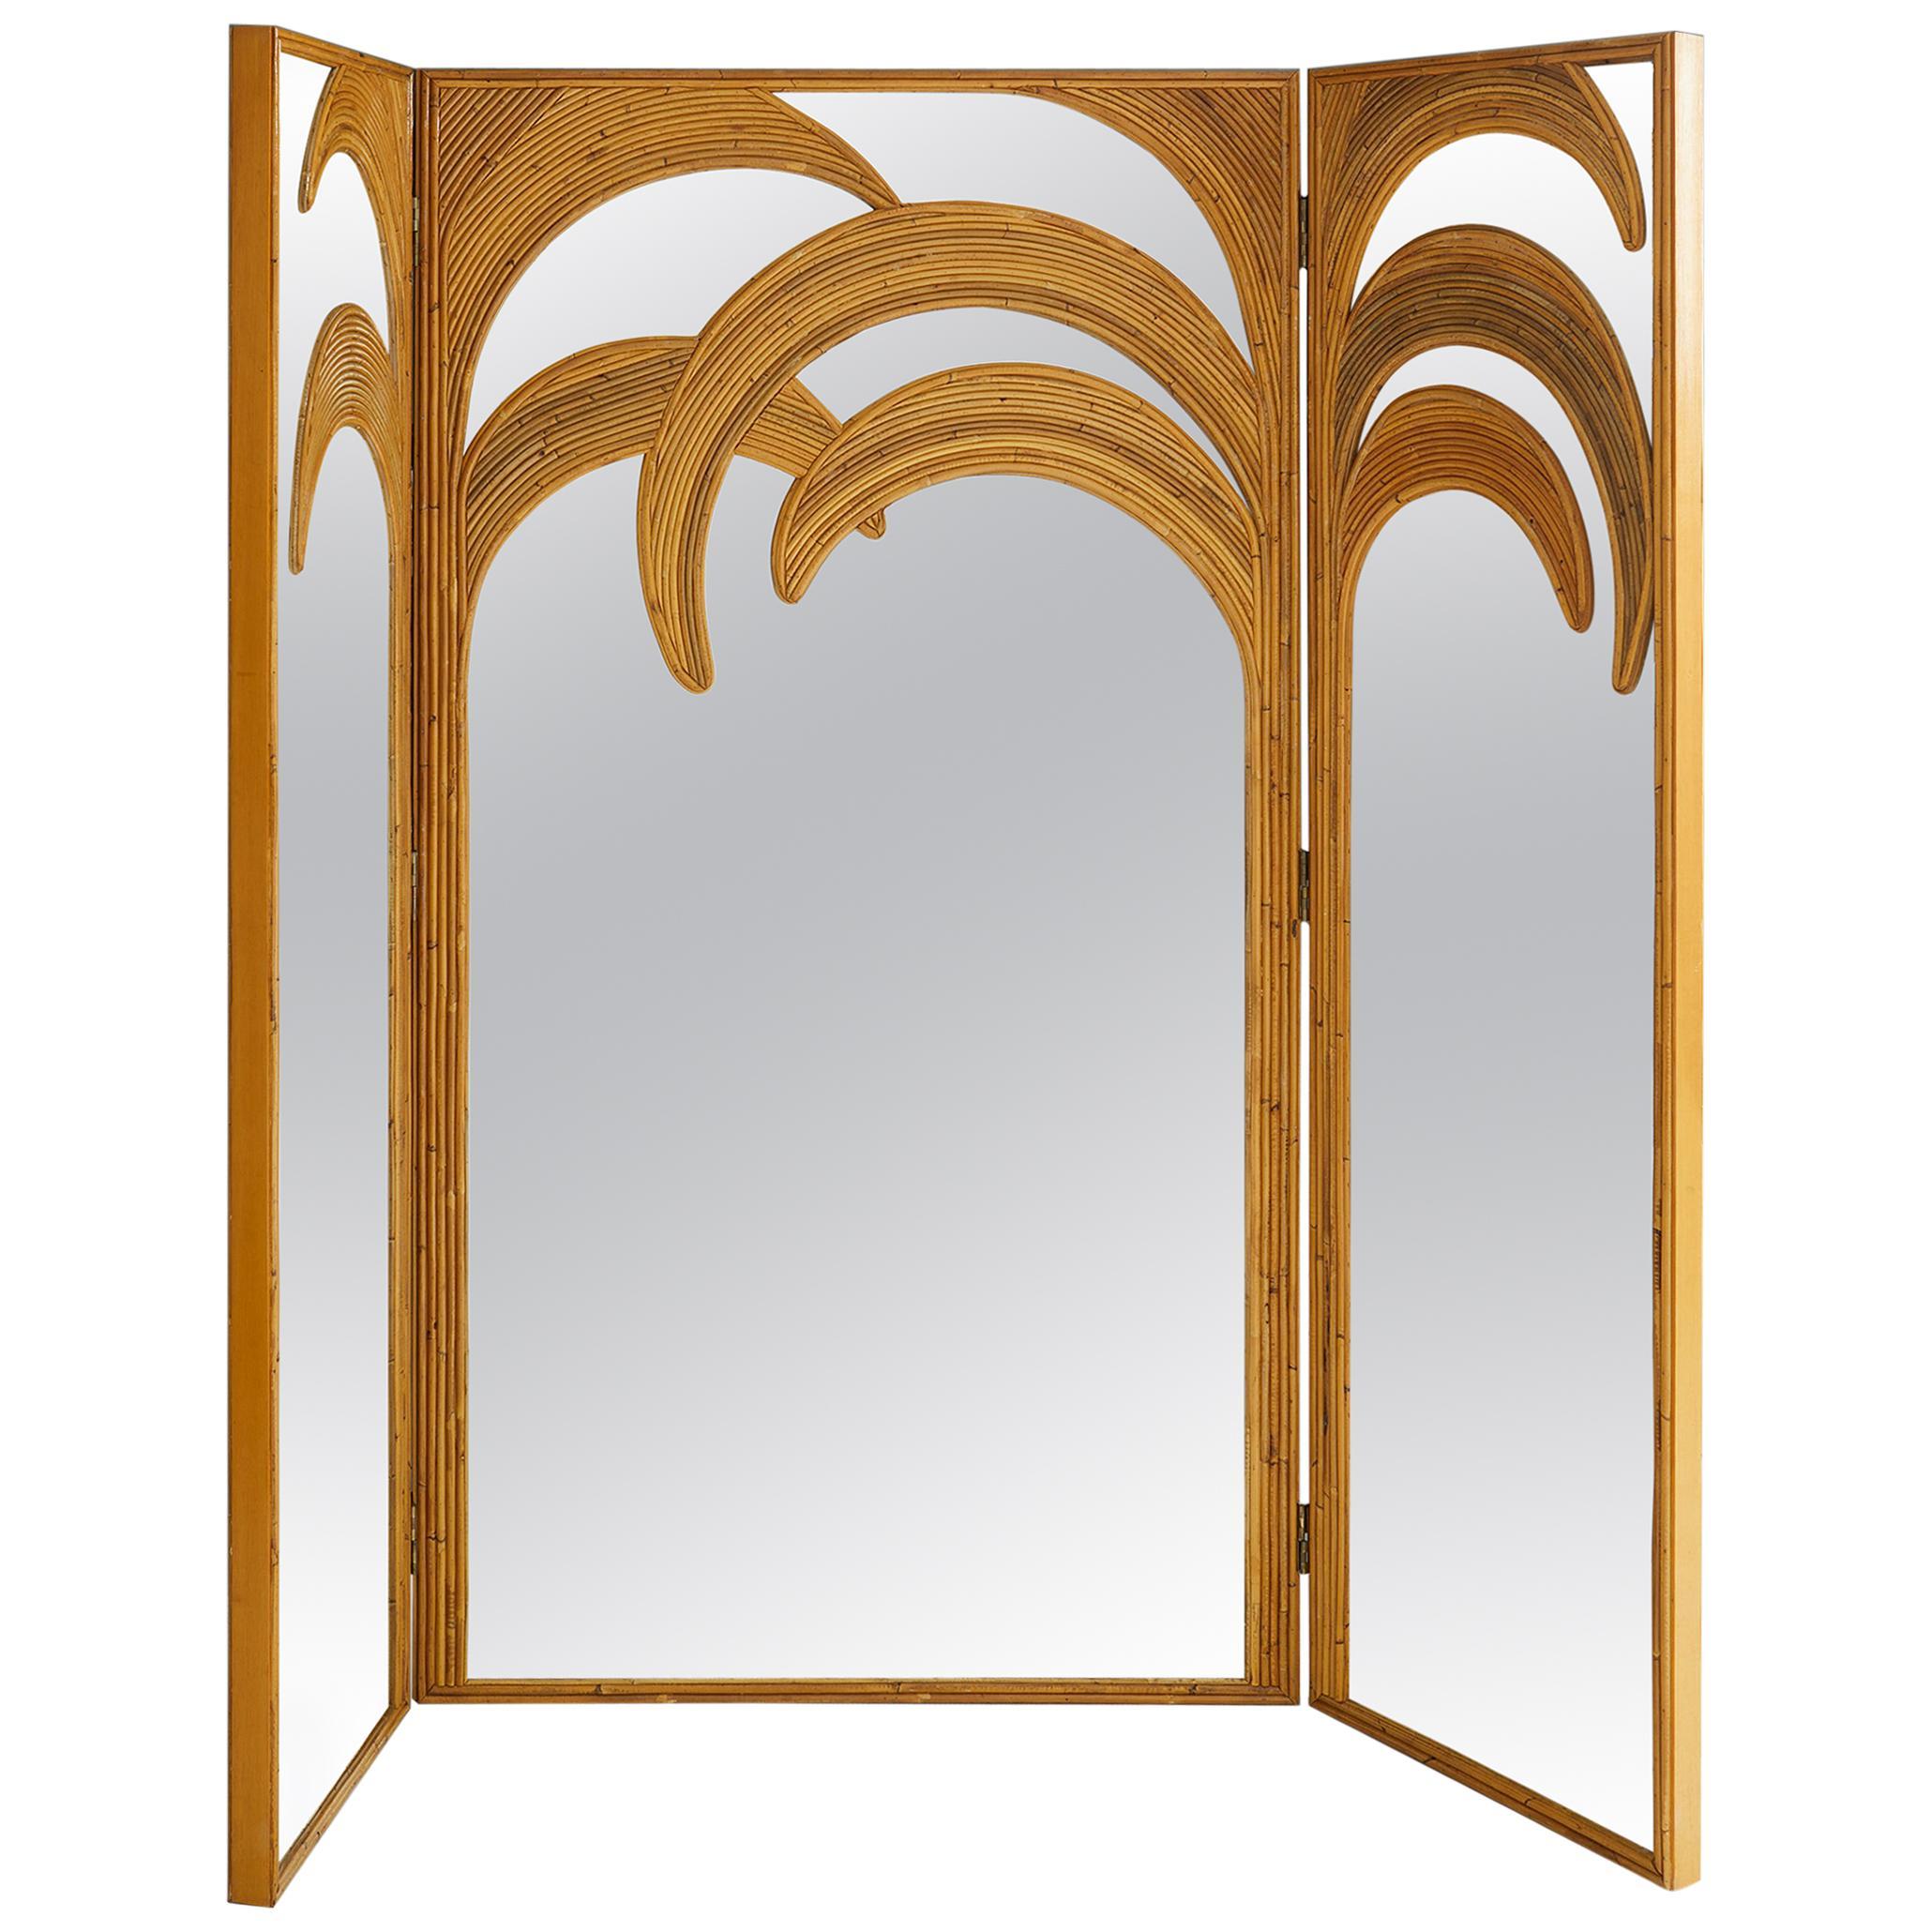 Bamboo Mirrored Screen, Vivai del Sud, Italy, 1970s